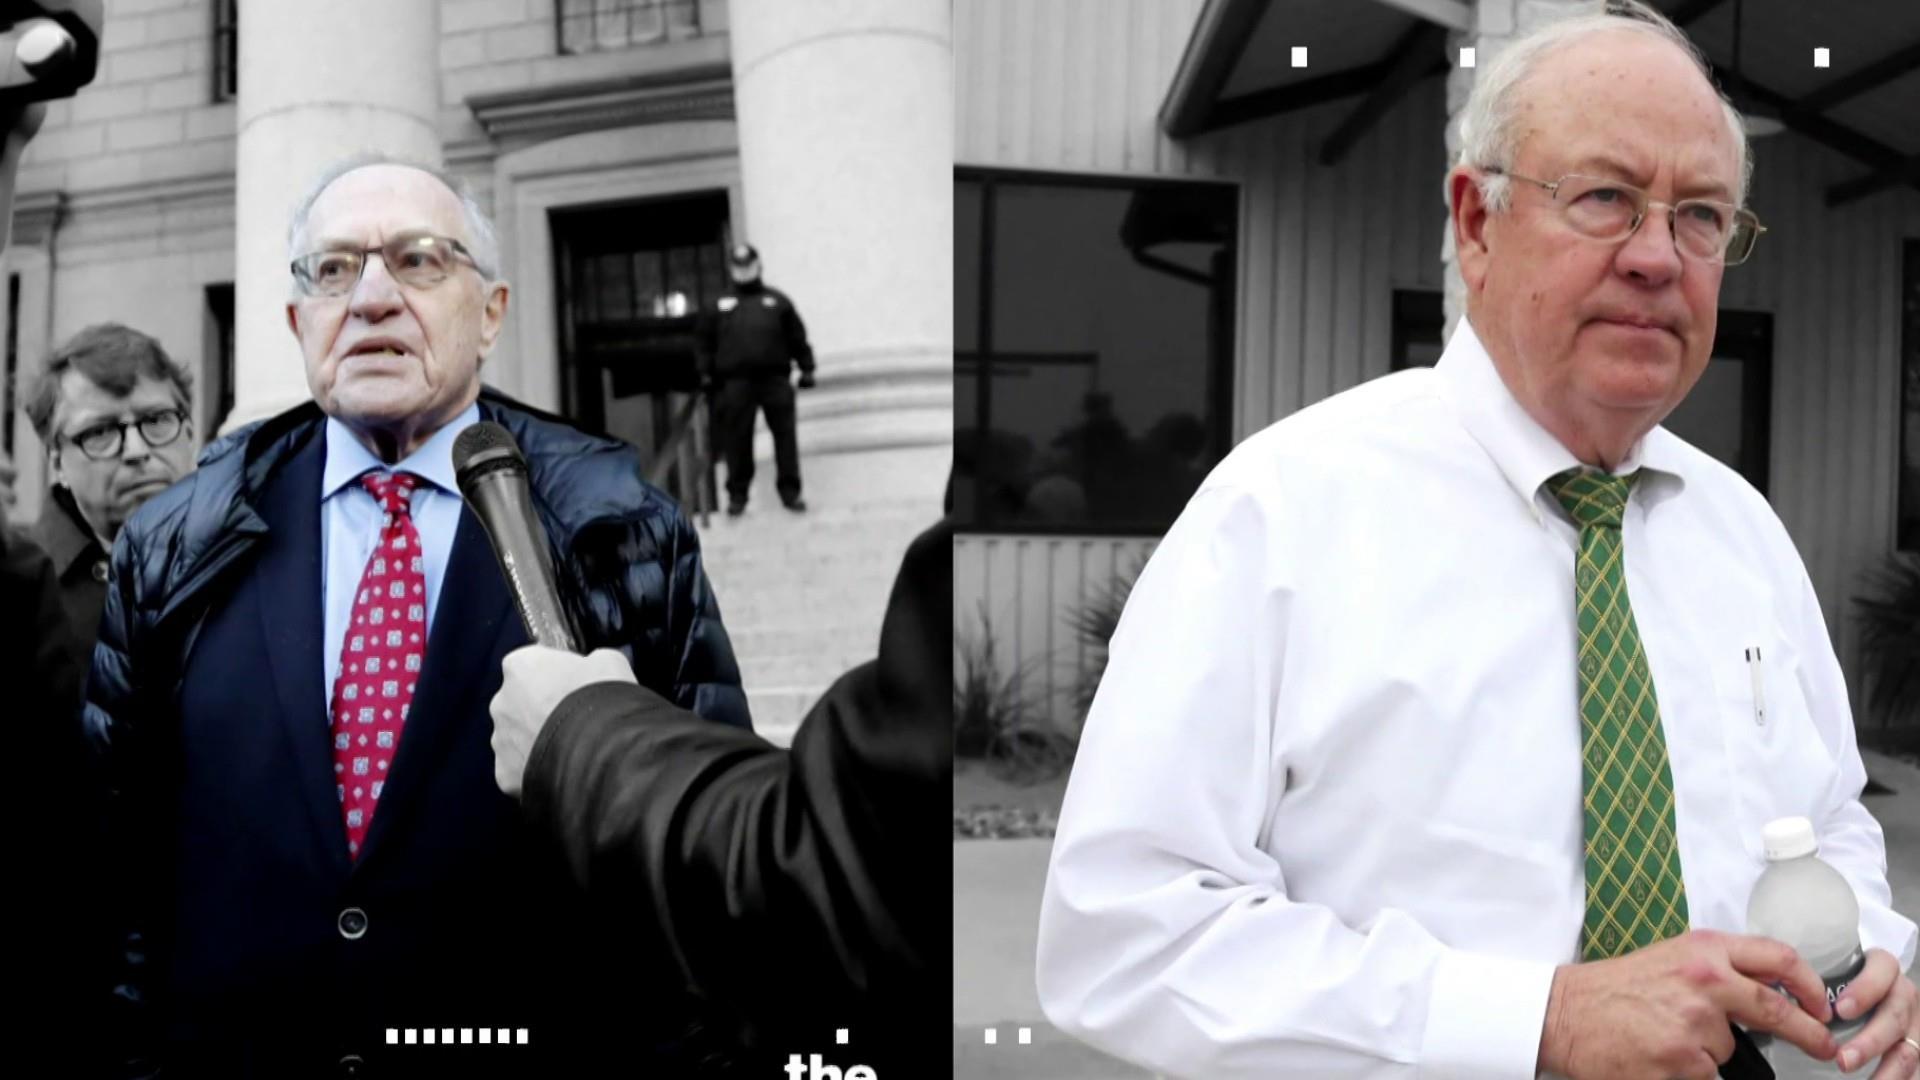 Trump assembles made-for-TV legal team for Senate impeachment trial